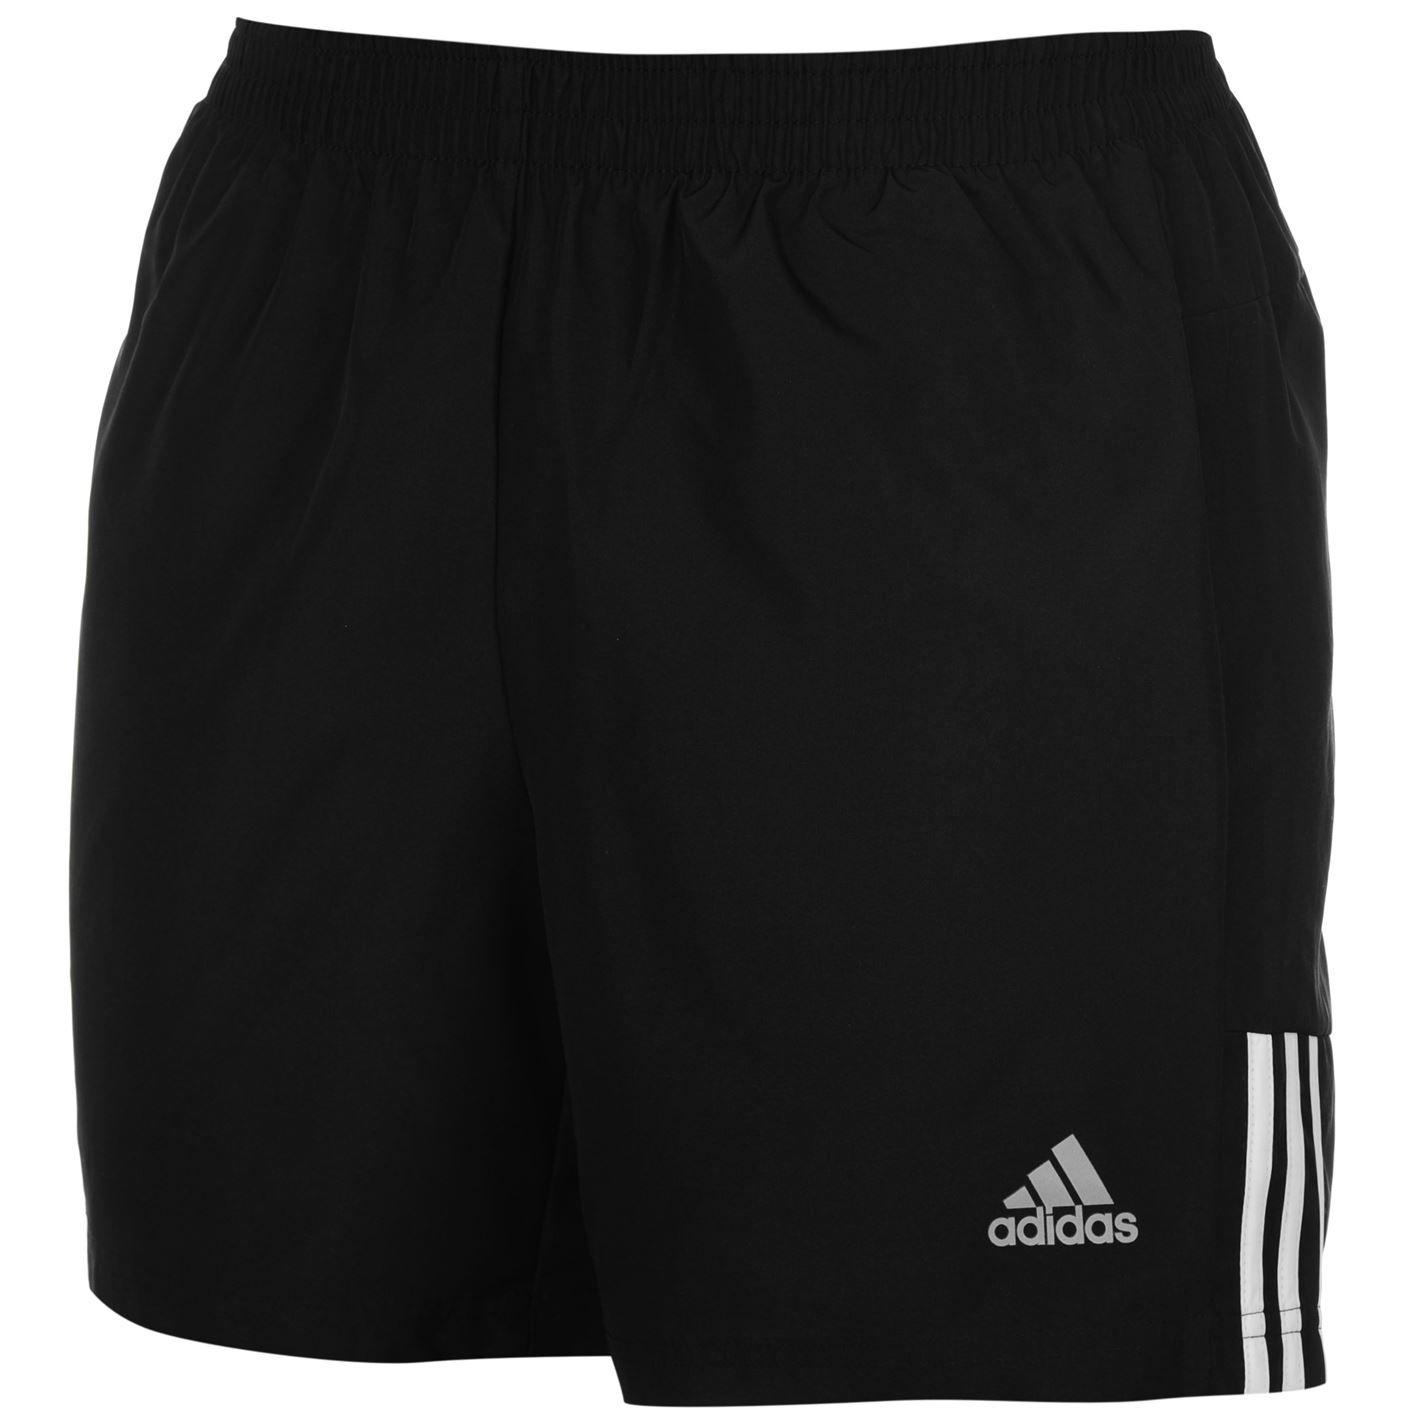 1eb147bae3 adidas Questar 5 Inch Shorts Mens | Fashion - Want. | Nike running ...